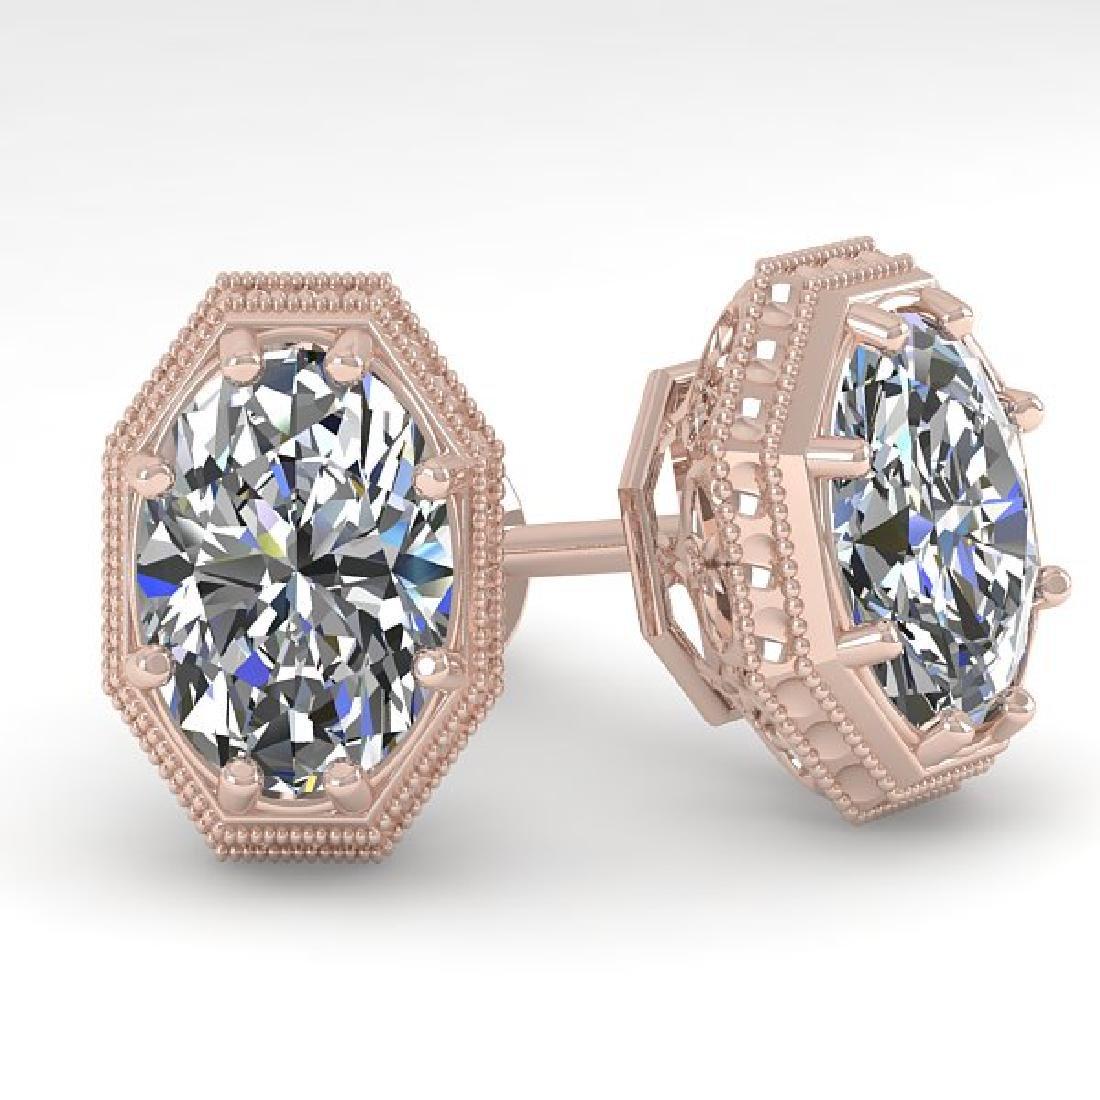 2 CTW VS/SI Oval Cut Diamond Stud Earrings 18K Rose